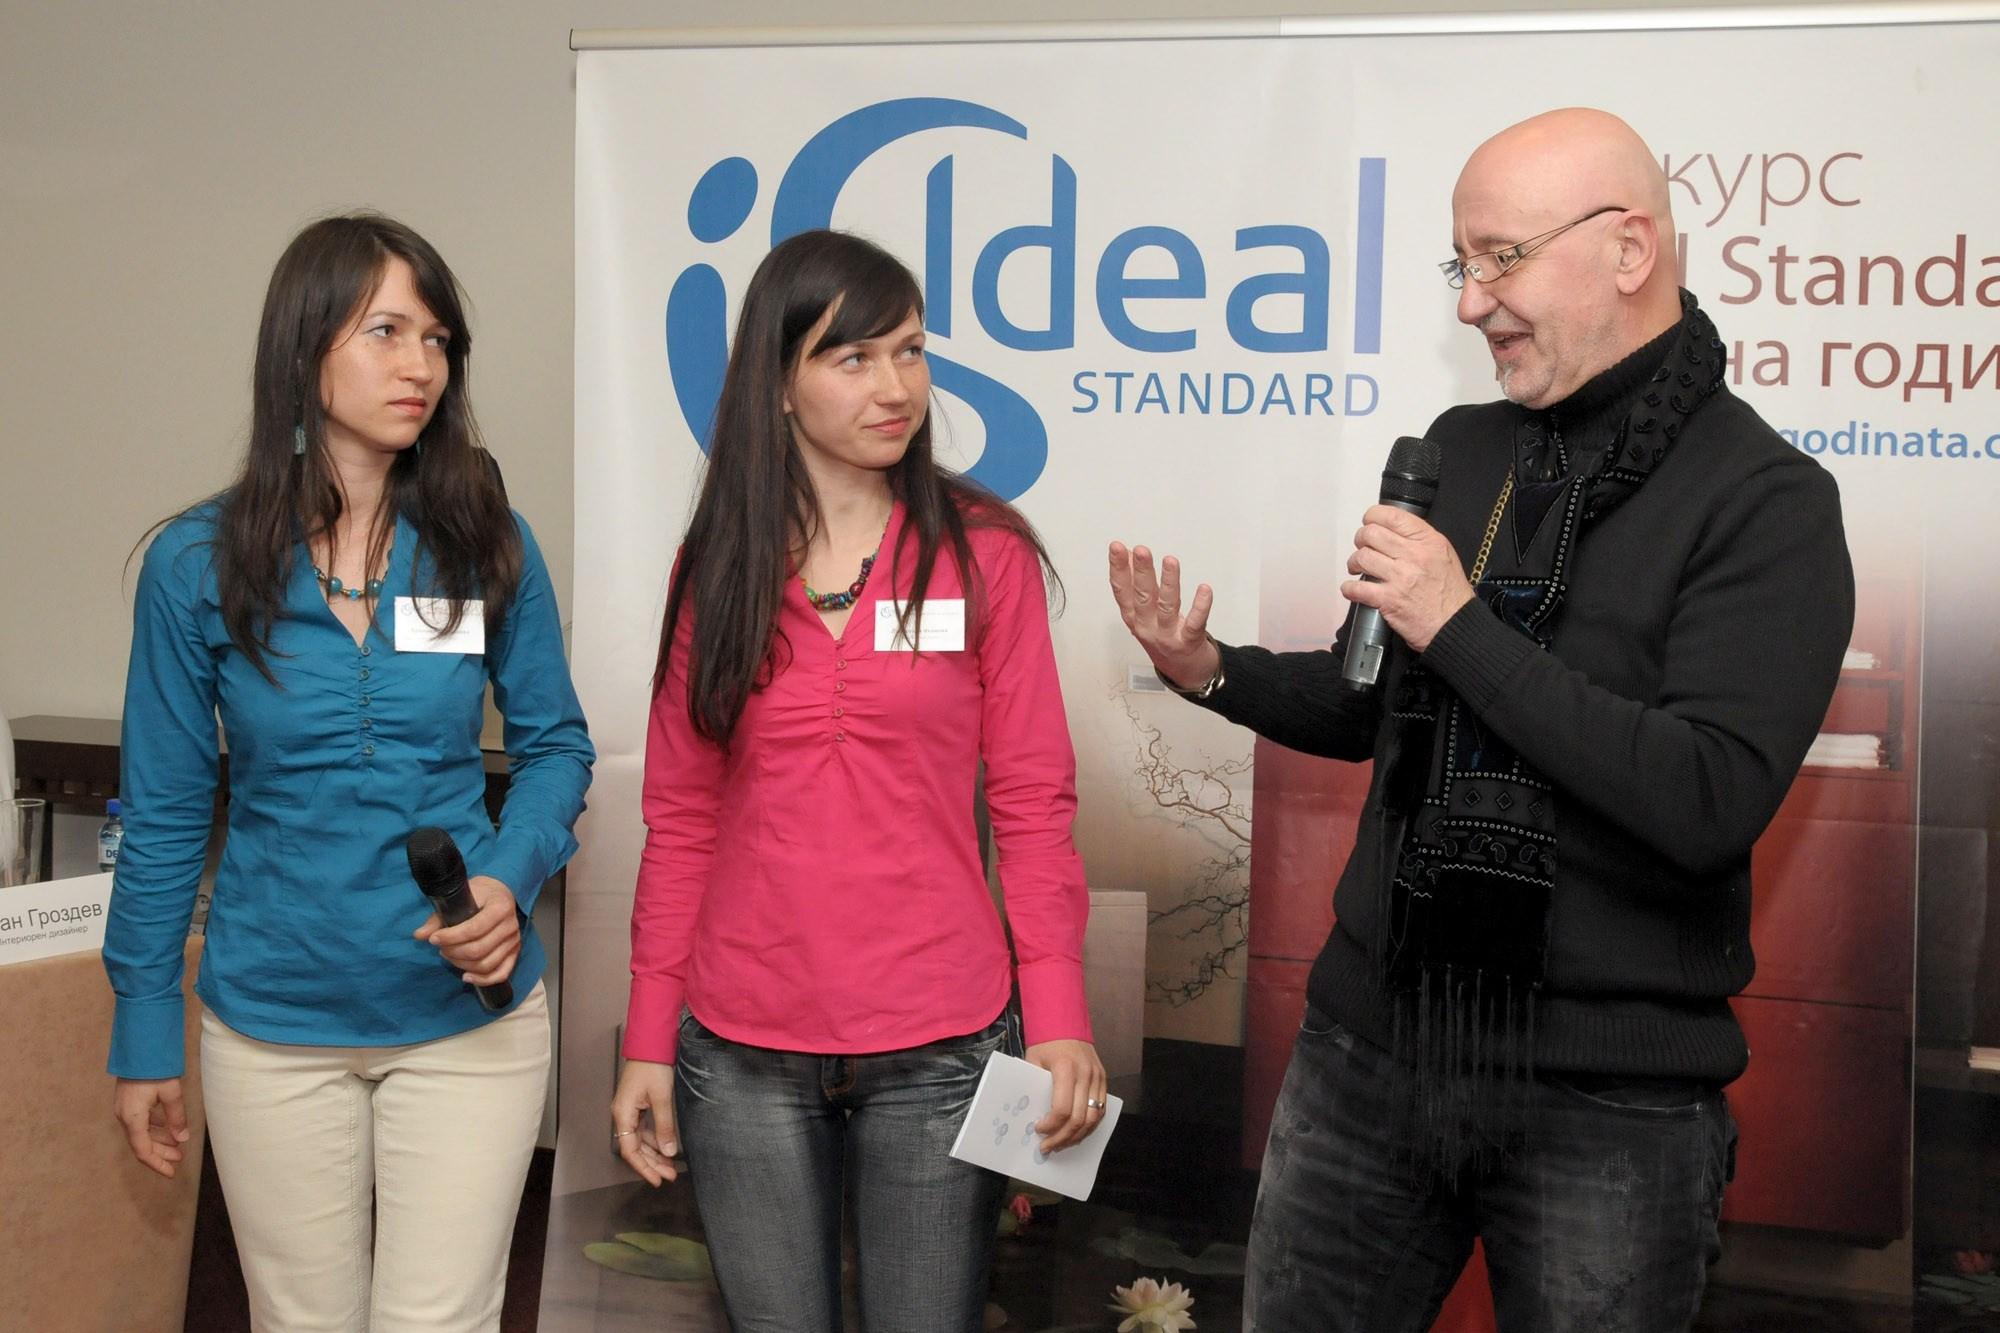 арх. Иван Александров връчва награда в конкурса Ideal Standardбаня на 2010